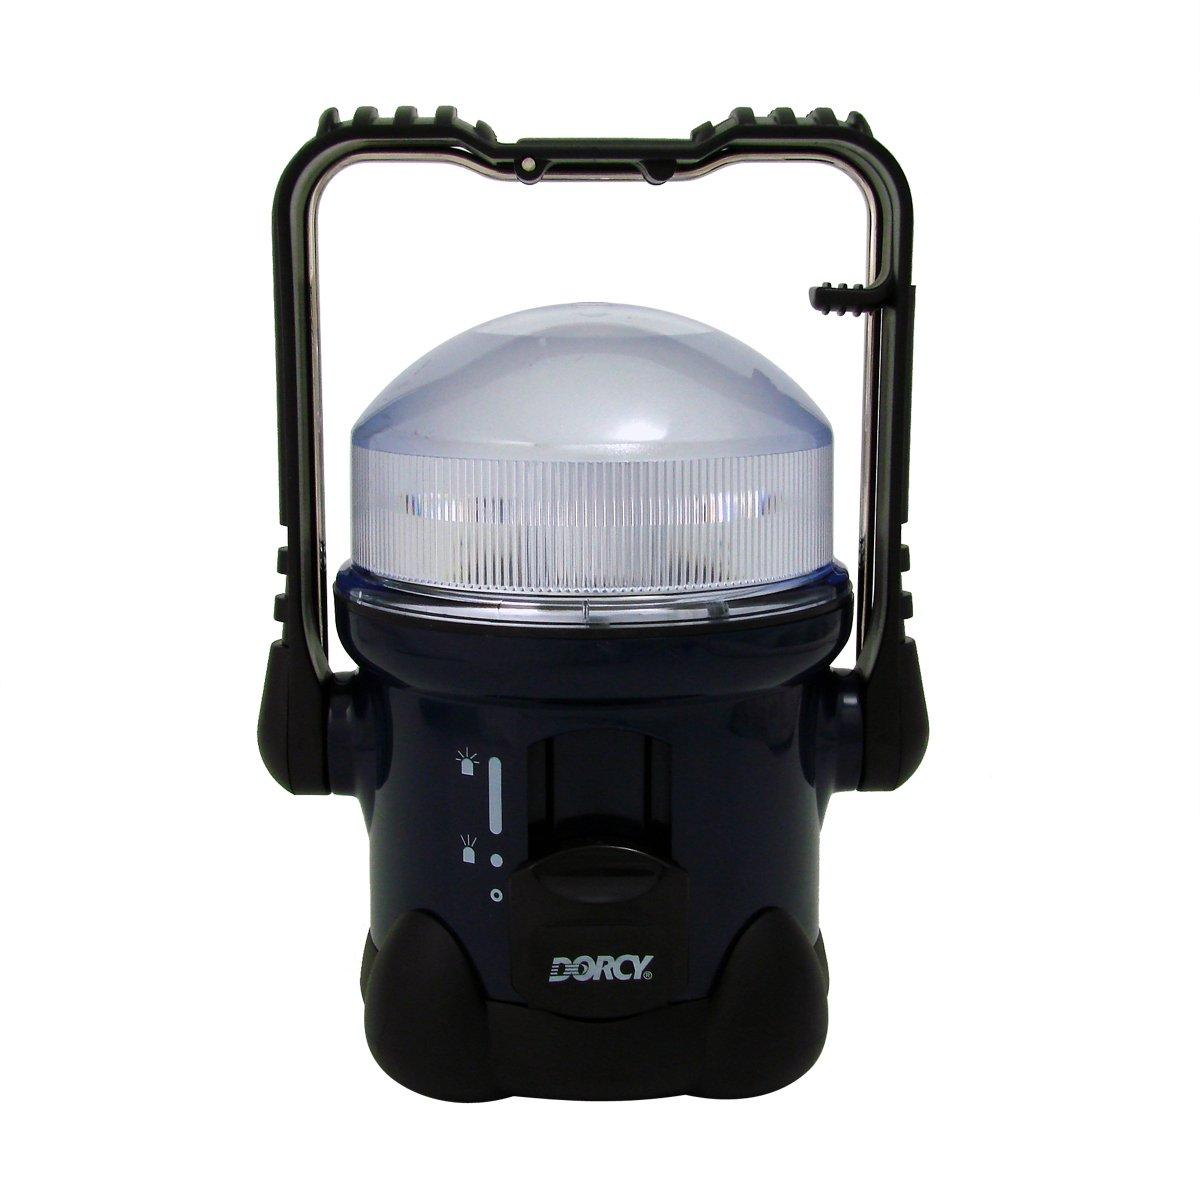 Focusing LED Area Lamp with Multi-Purpose Handle 41-1019 Dorcy 40 Lumen Portable